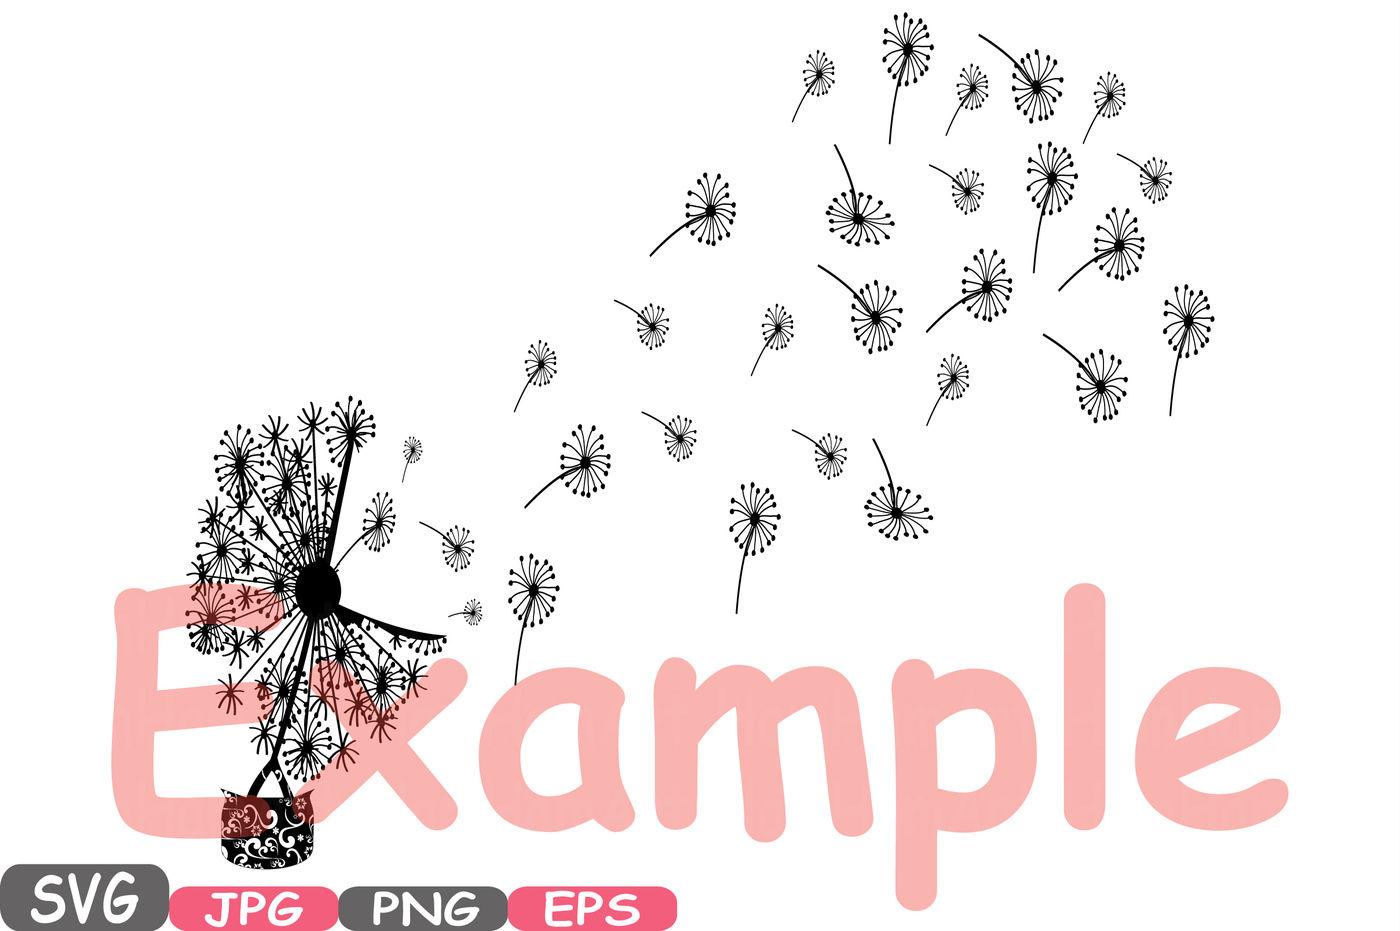 Wildflower Dandelion You Blow Me Away Svg Word Art Silhouette